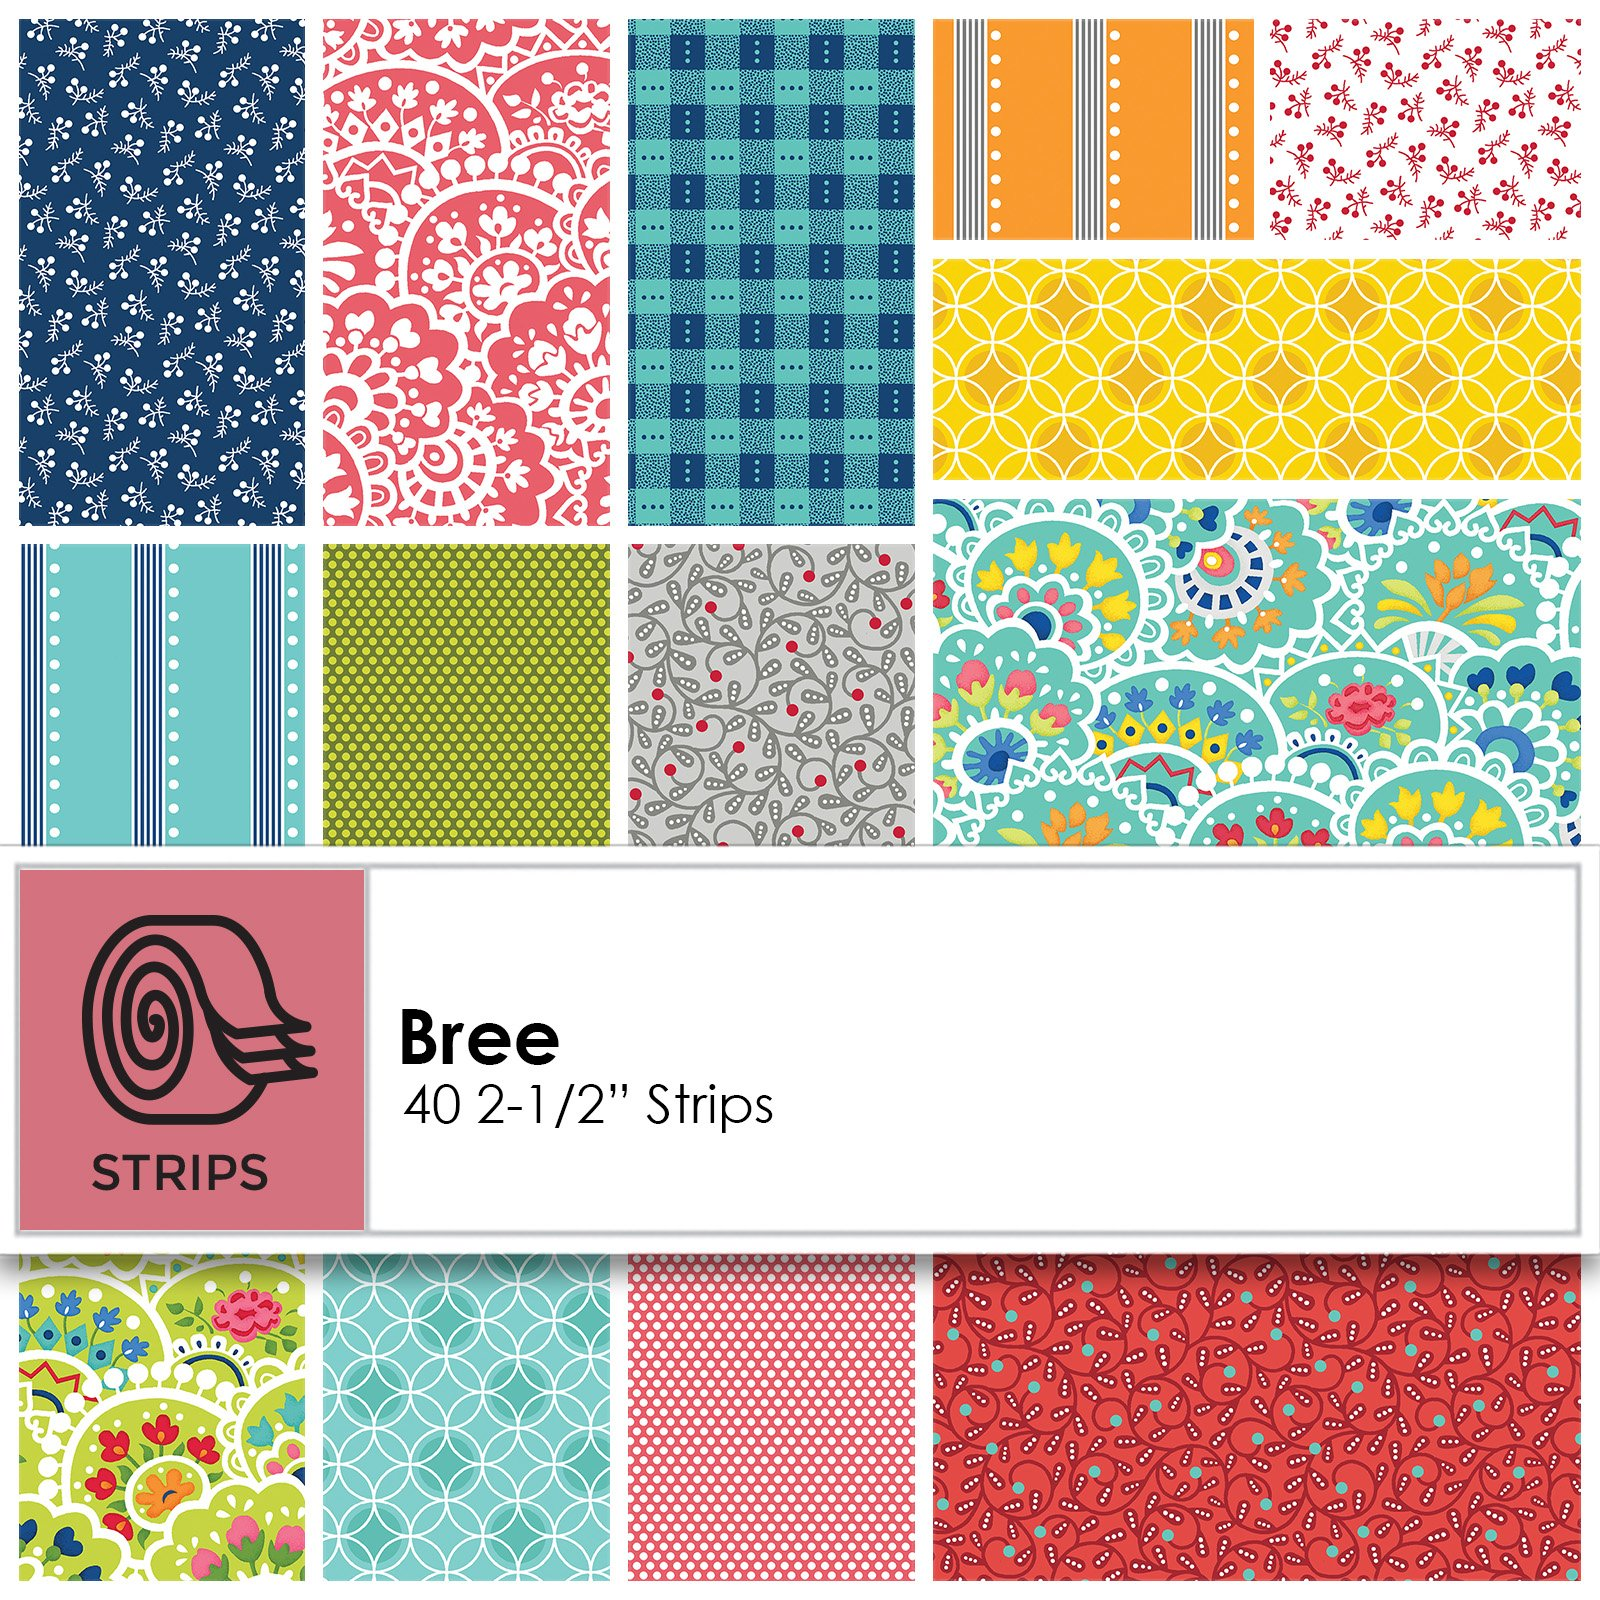 Strips - Bree<br/>Benartex PWBRE